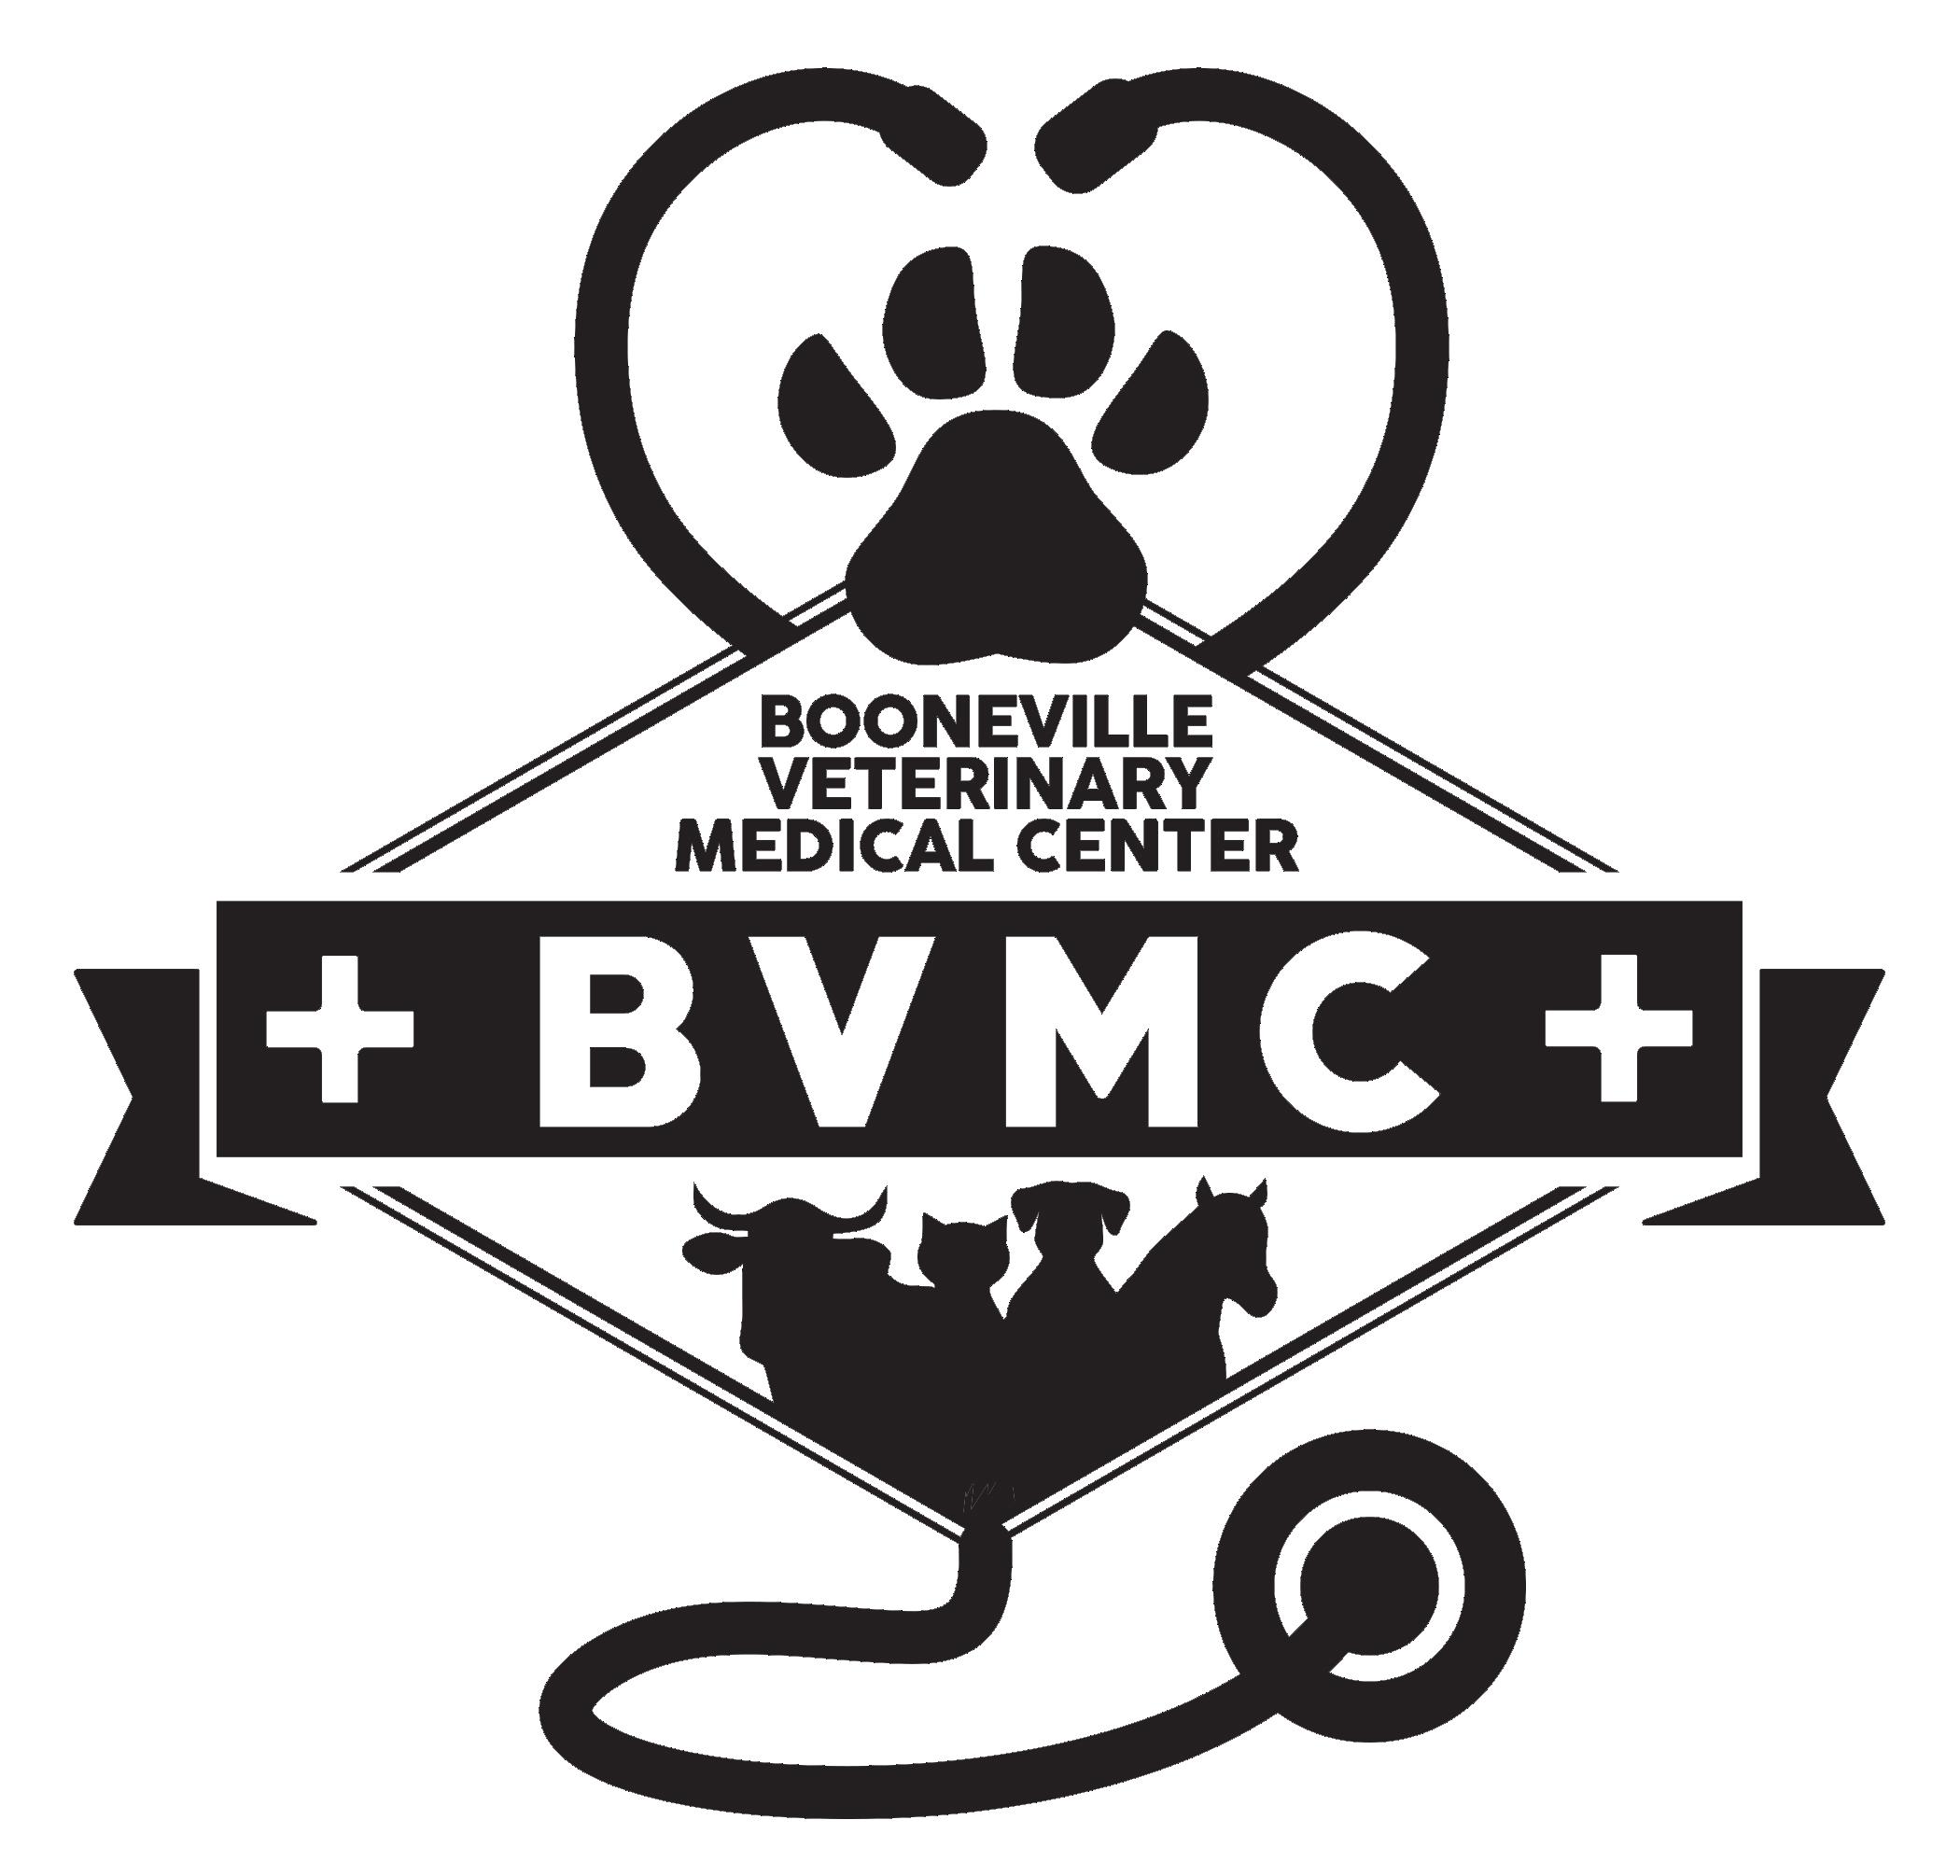 Booneville Veterinary Medical Center Veterinarian In Booneville Ms